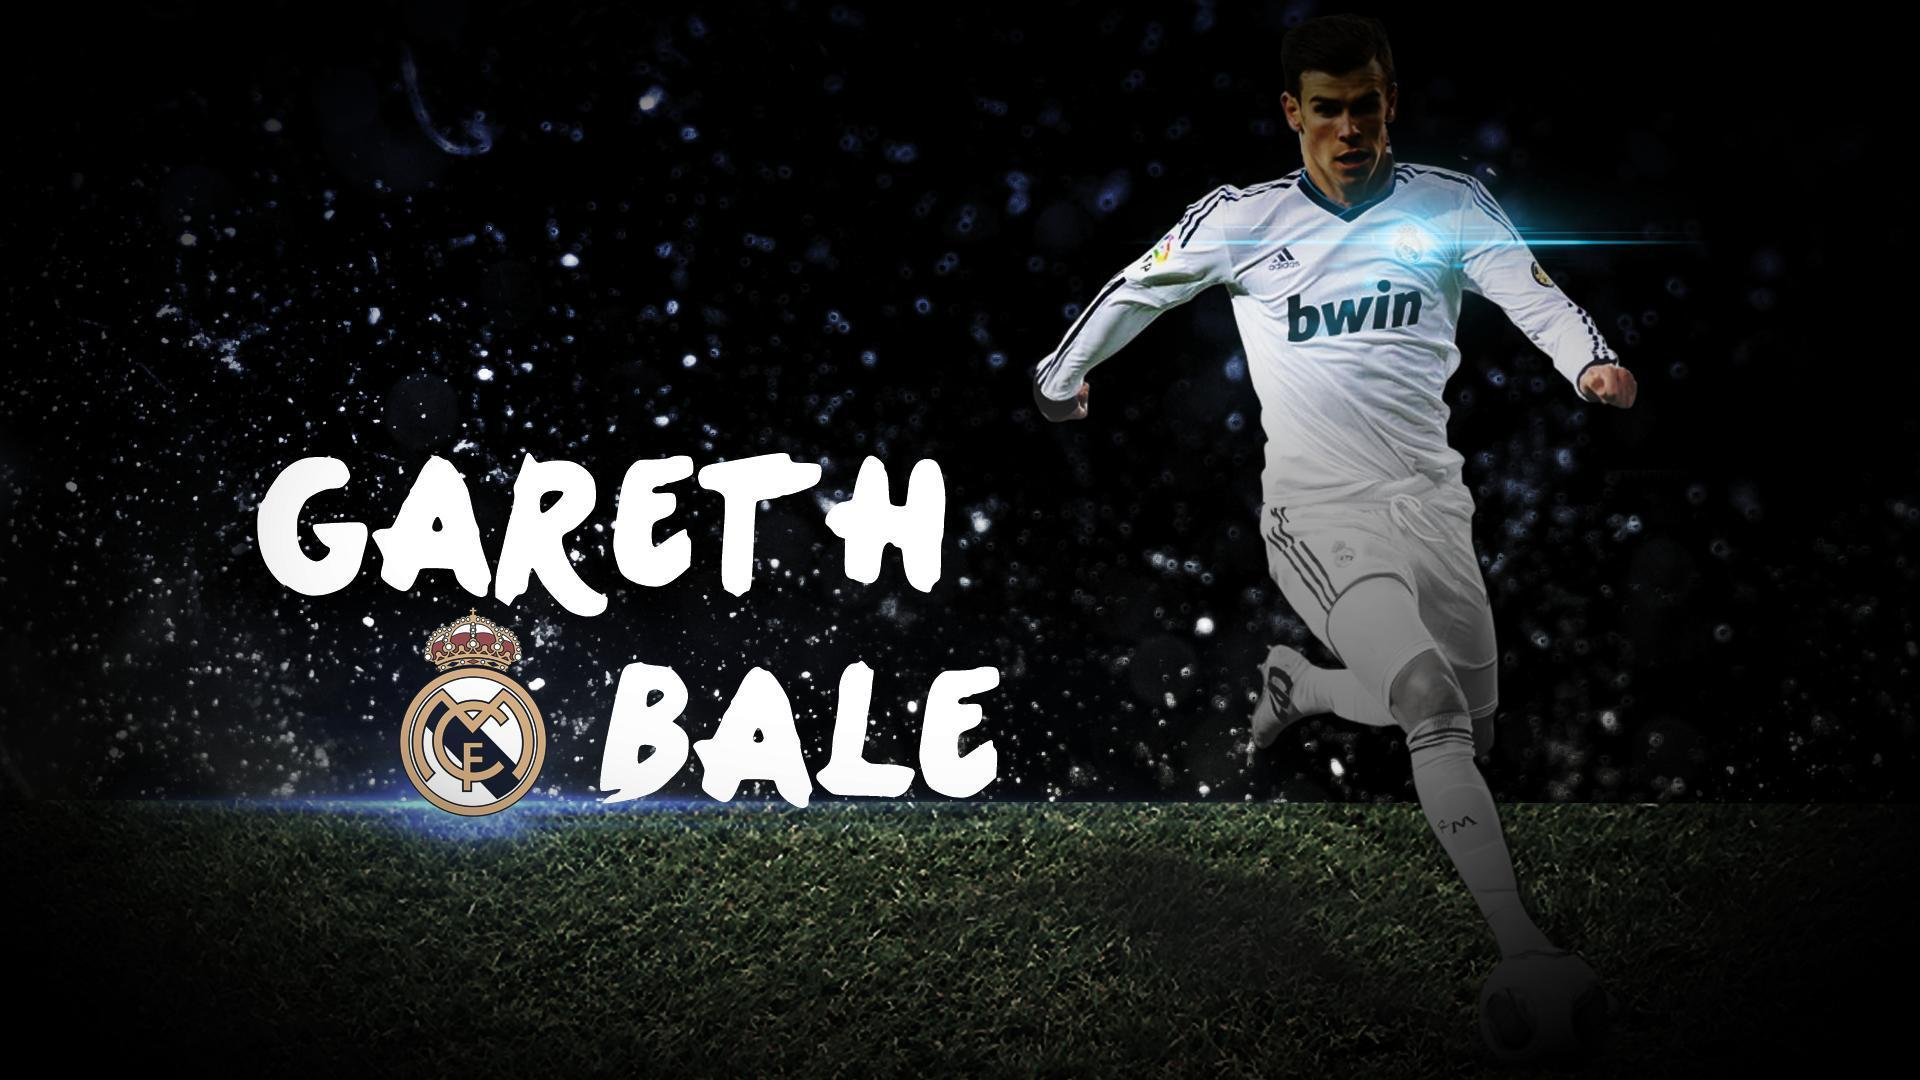 Fonds d'écran Gareth Bale : tous les wallpapers Gareth Bale